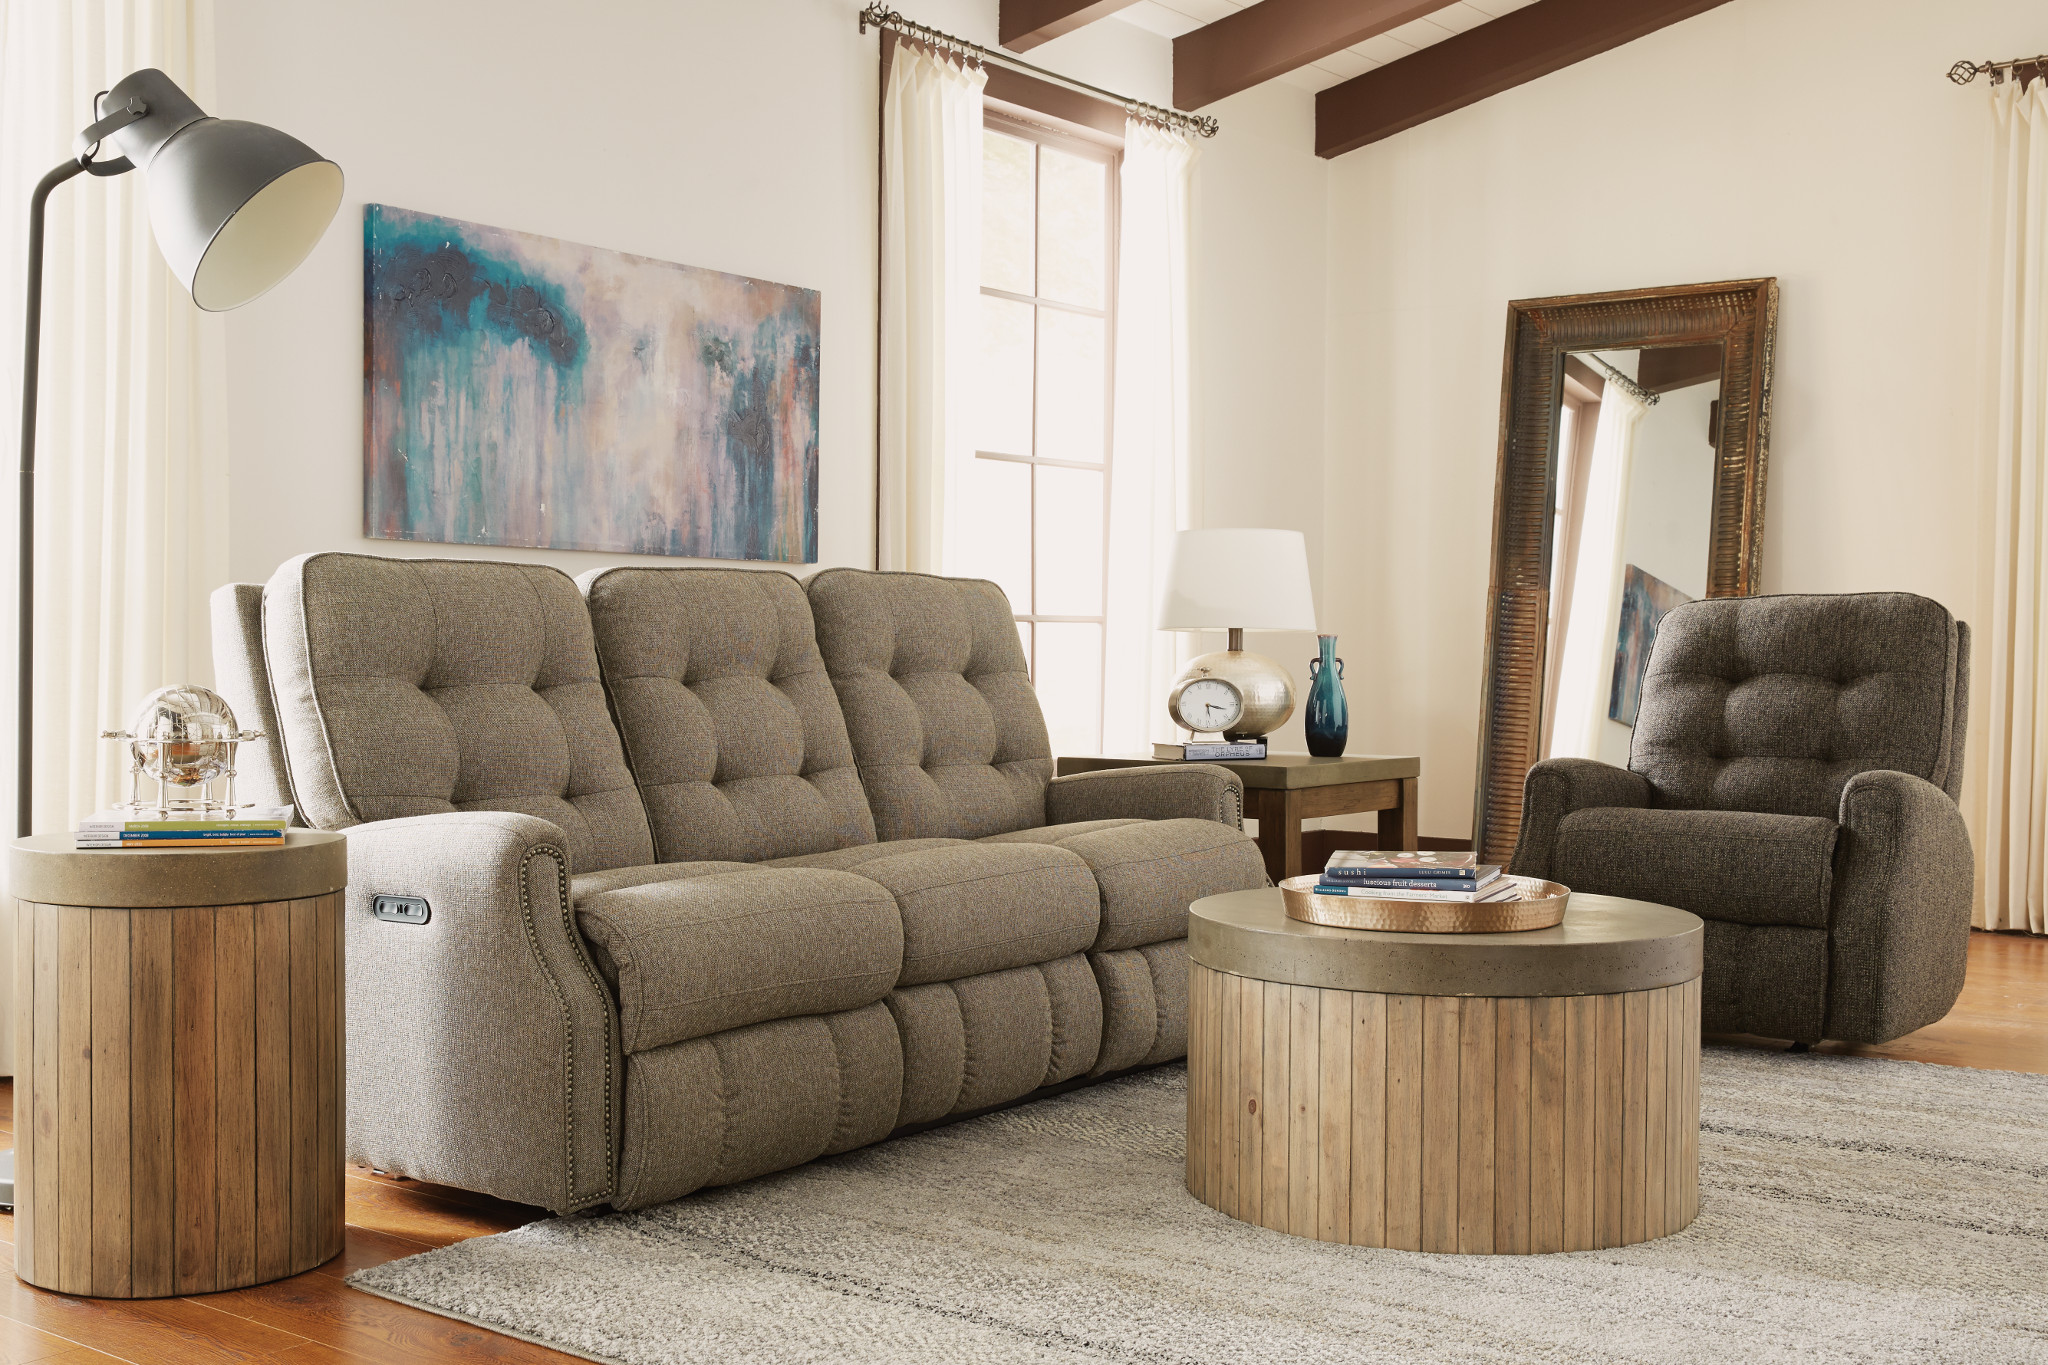 chattanooga reclining living room furniture e f brannon furniture. Black Bedroom Furniture Sets. Home Design Ideas